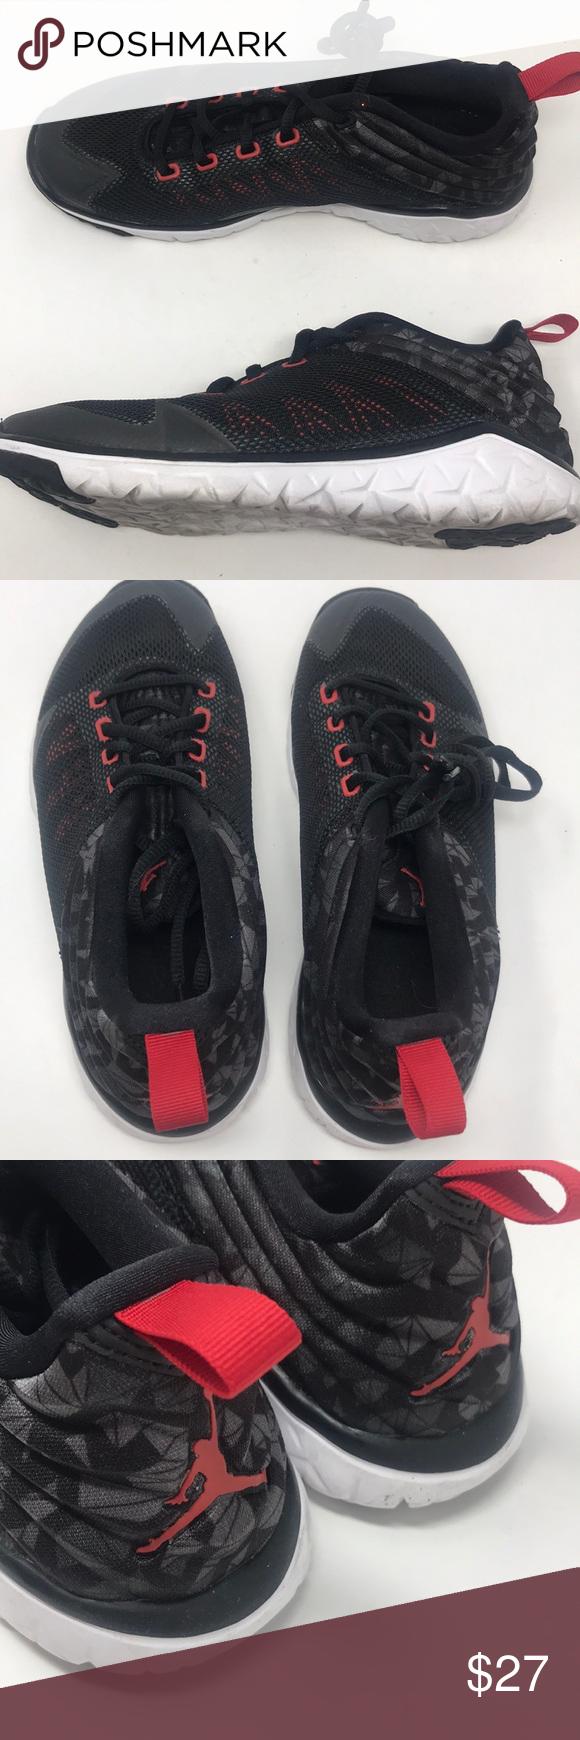 Nike Jordan trainer boys size 6 black